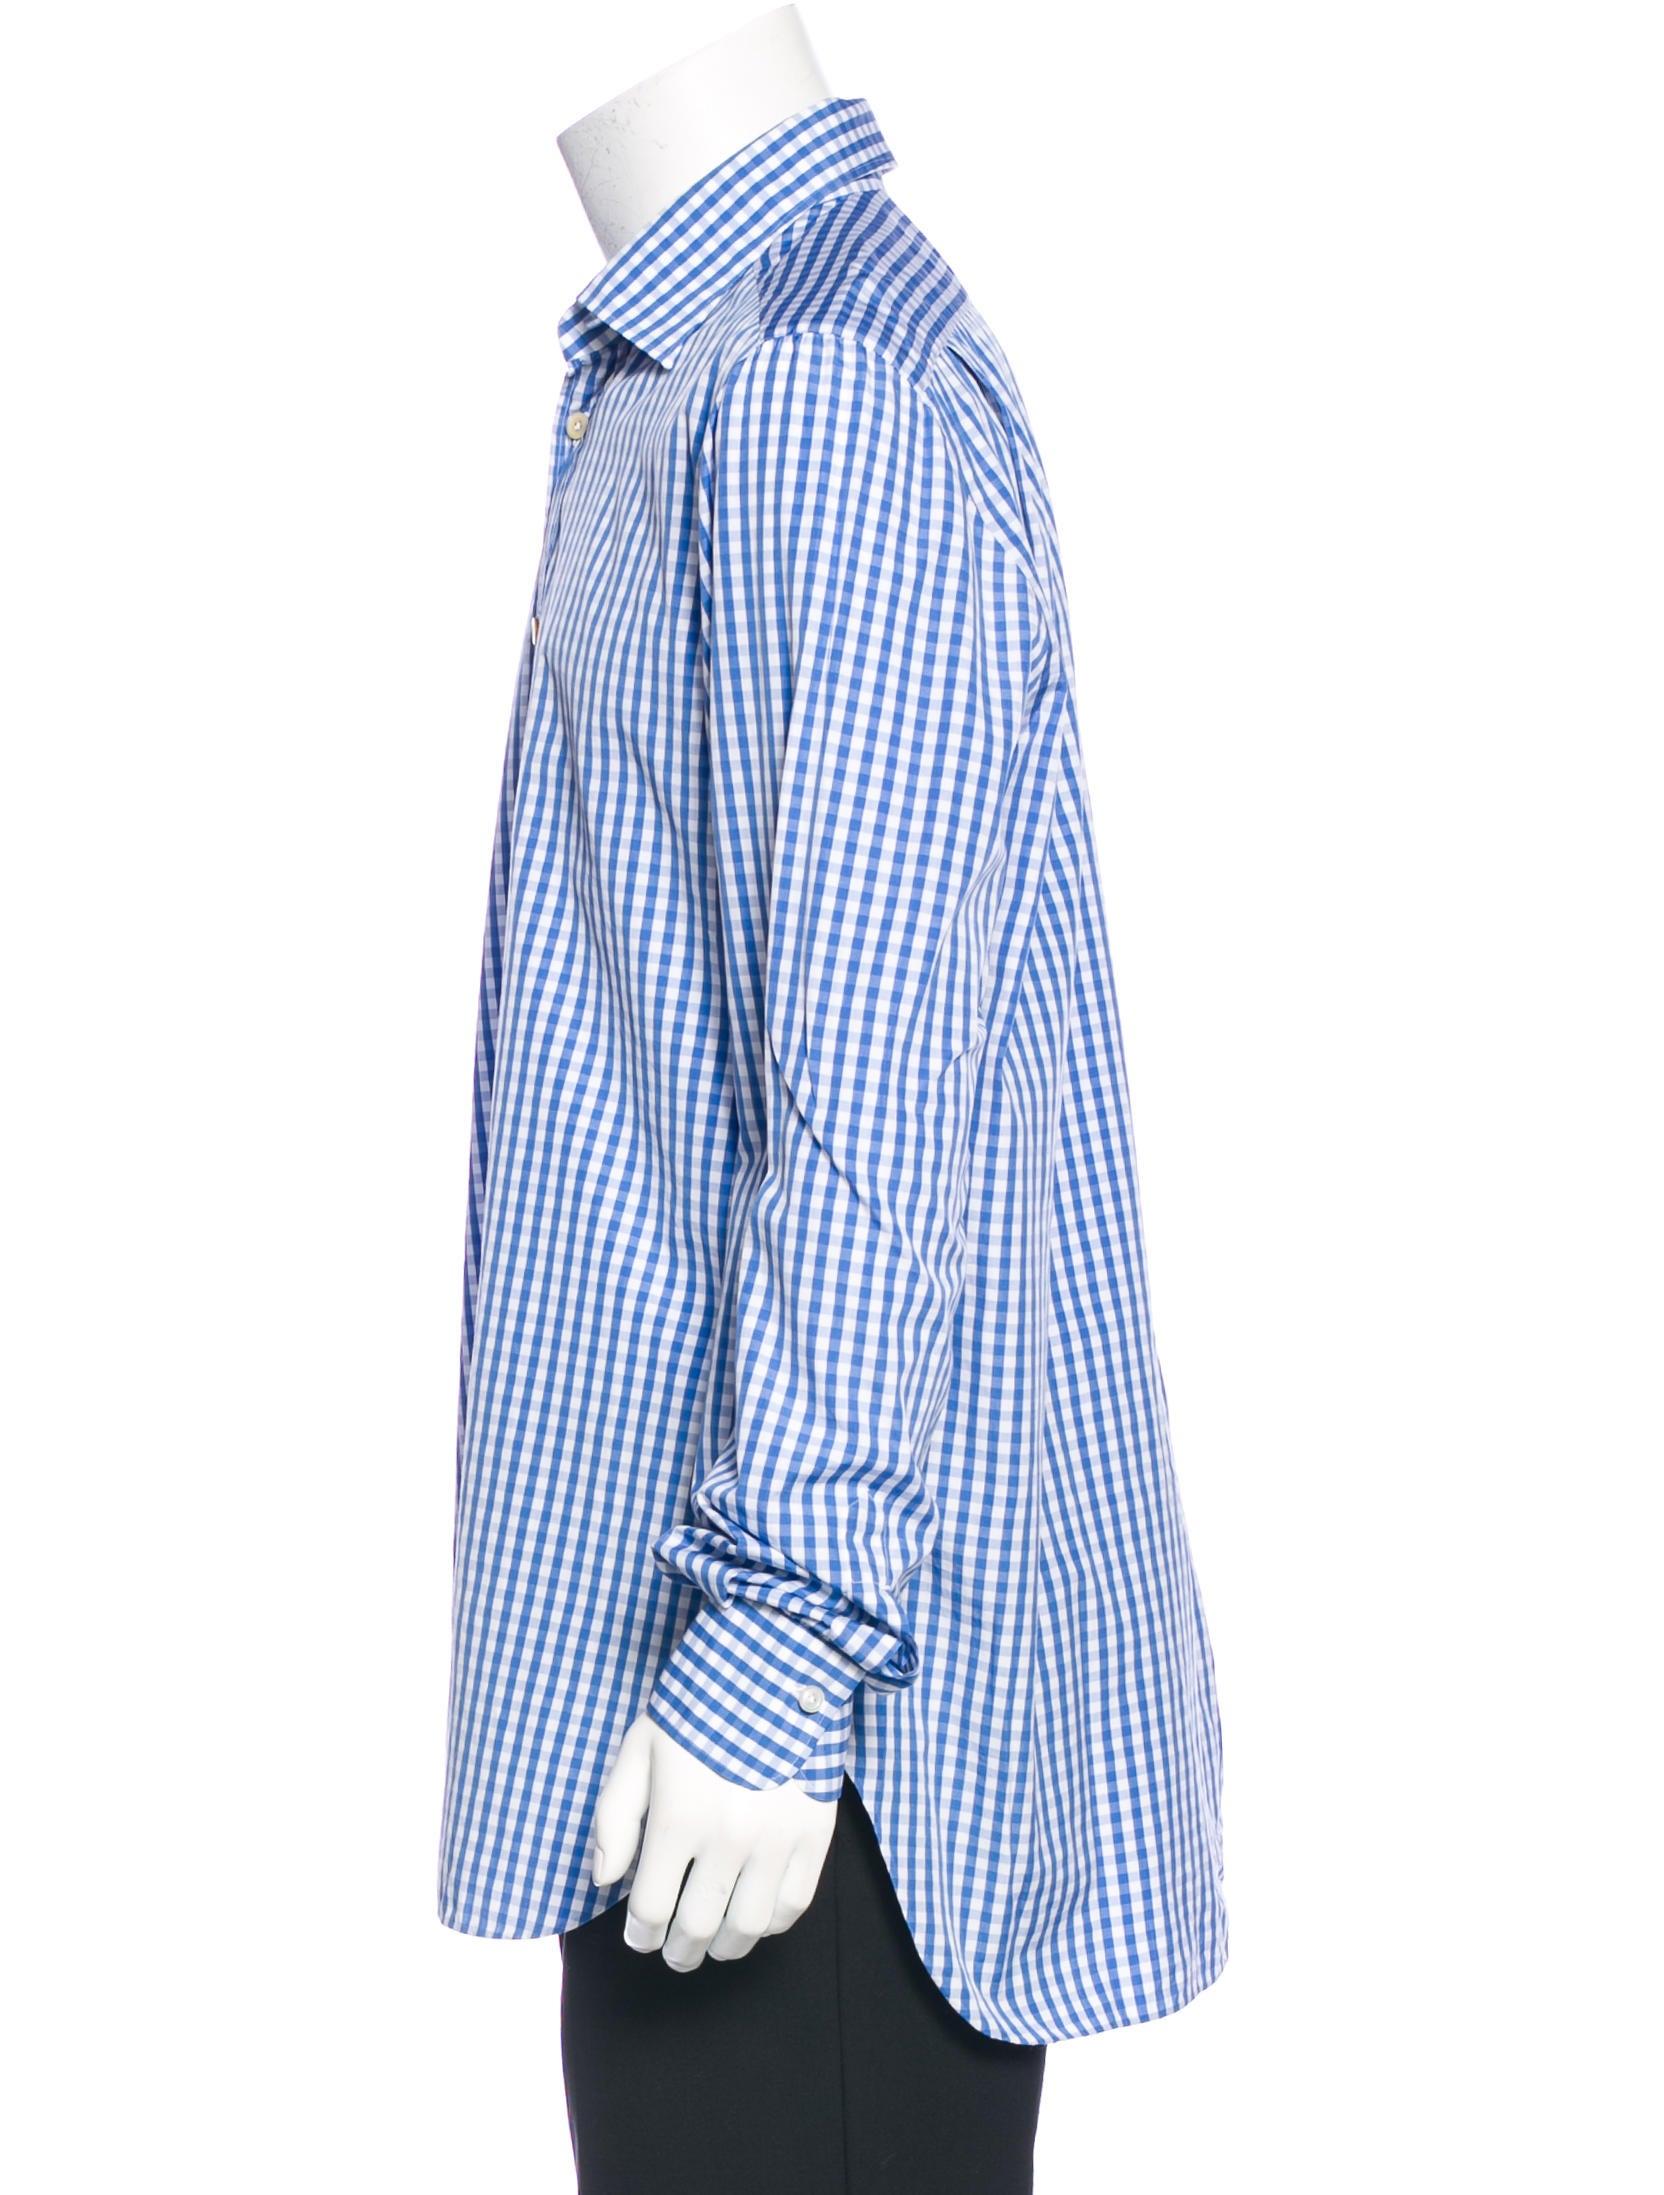 Kiton gingham dress shirt clothing kit21261 the realreal for Men s red gingham dress shirt